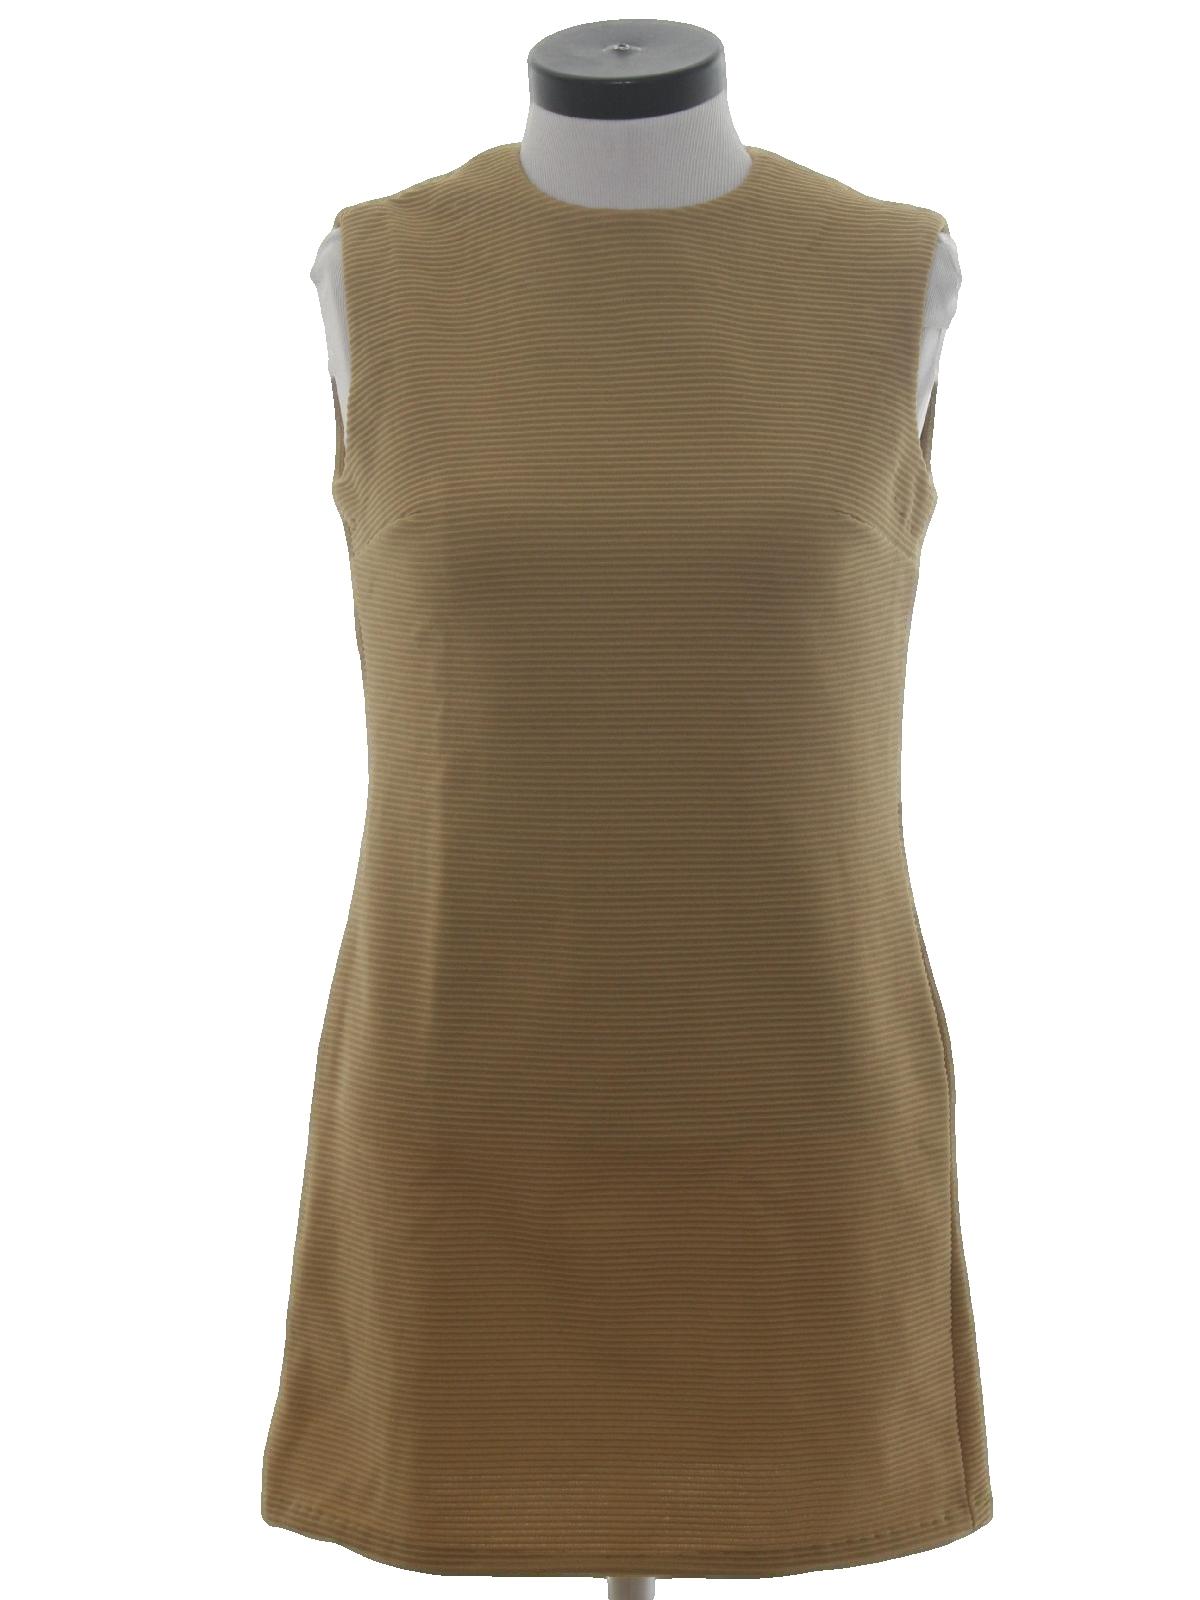 Polyester Knit Blouses Wholesale - Black Dressy Blouses